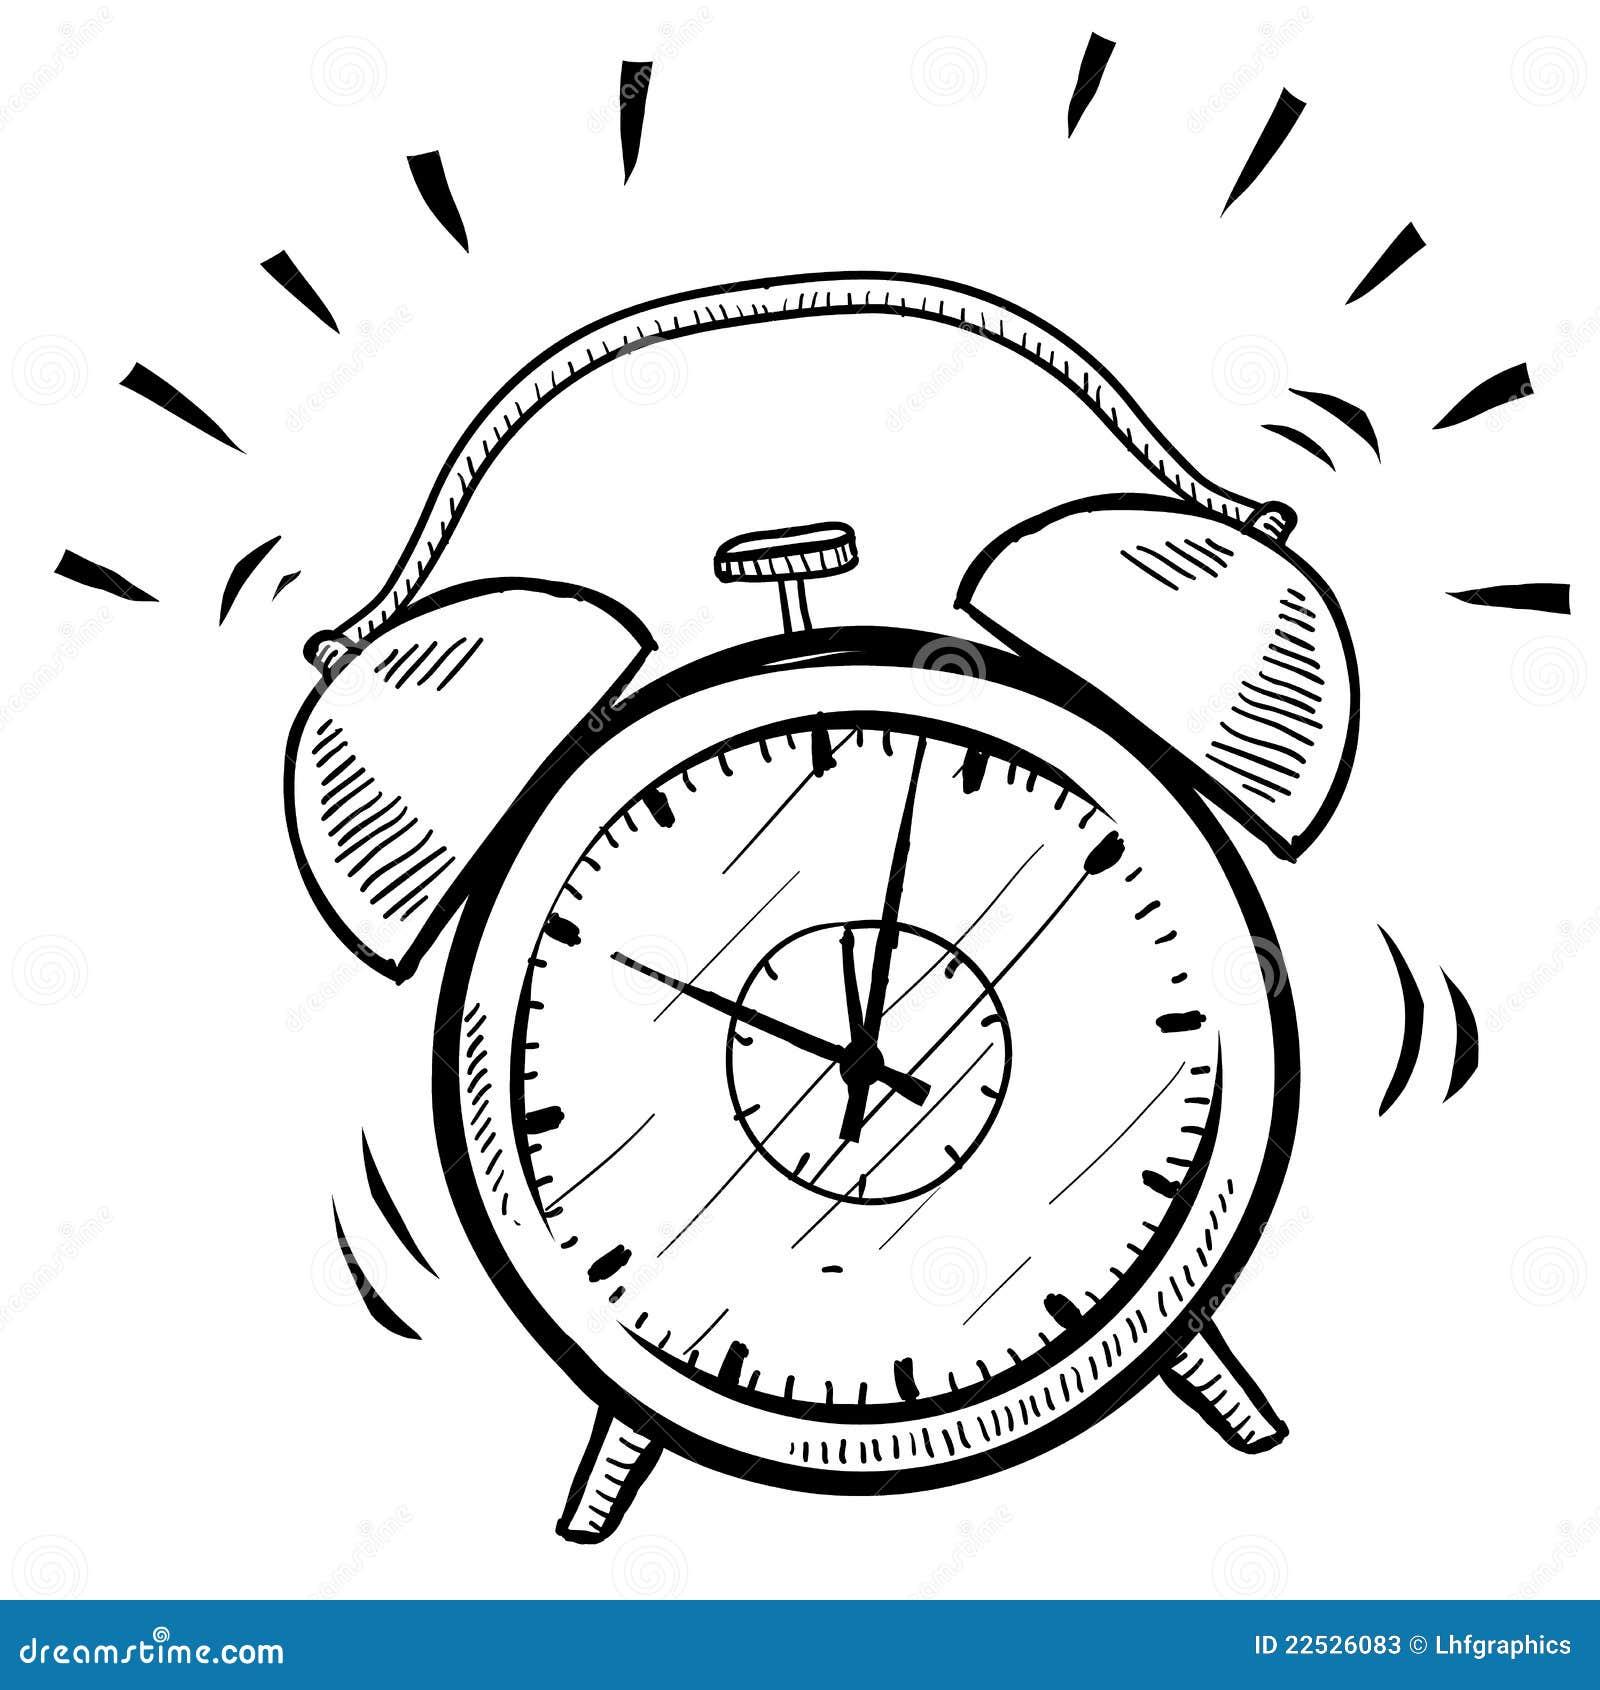 Clocks  Best Alarm Clocks and Walk Clocks for Sale Online